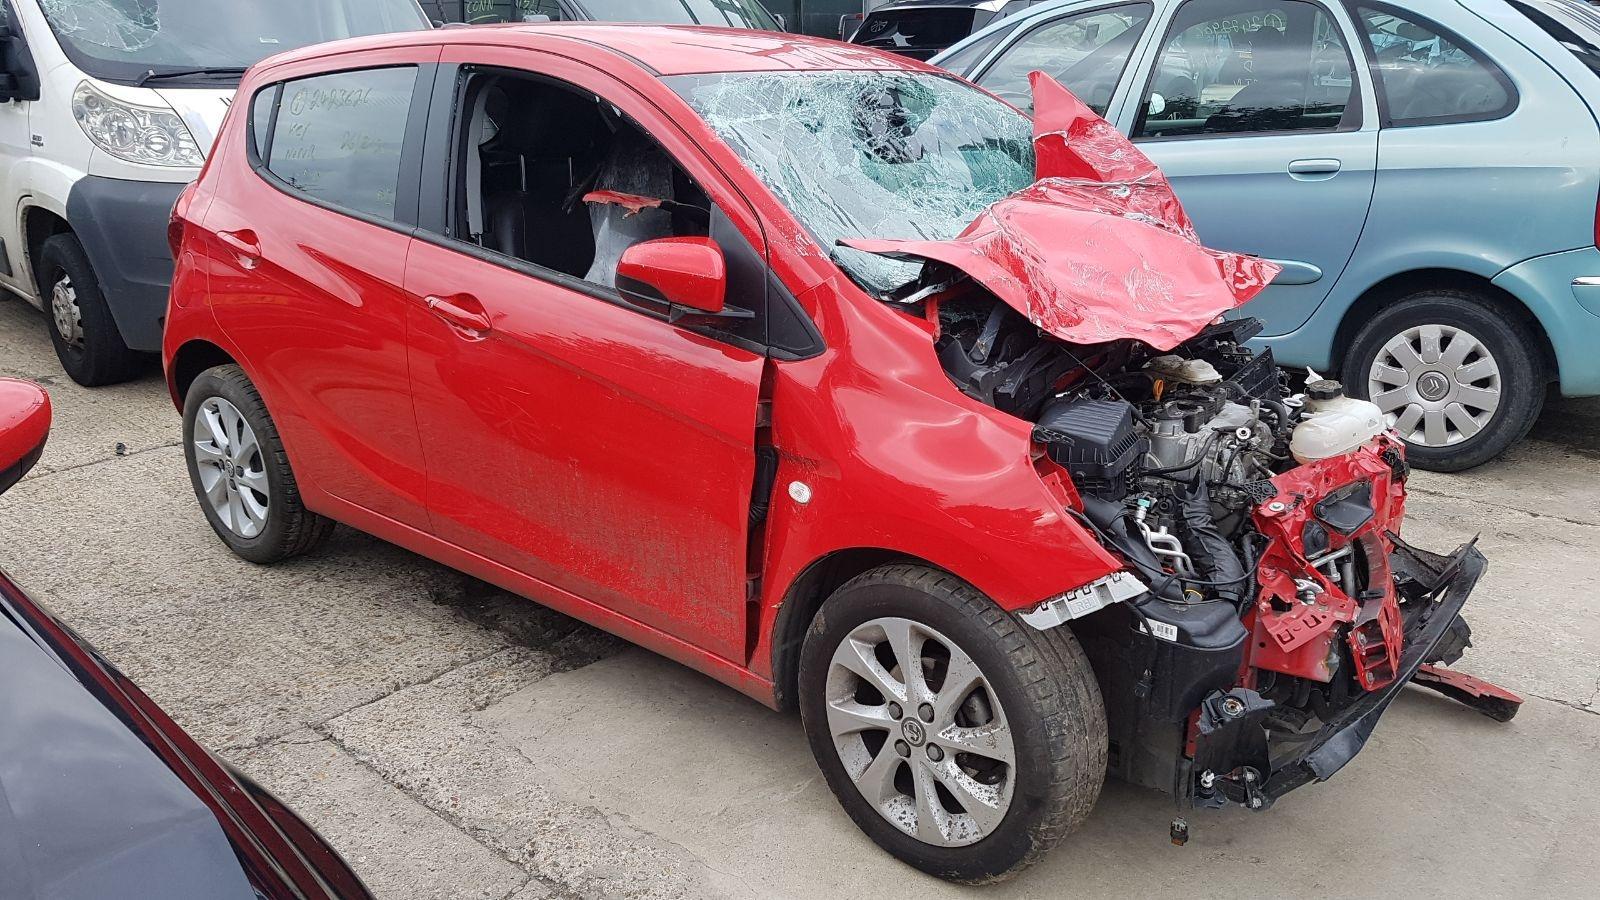 Image for a Vauxhall Viva 2016 5 Door Hatchback